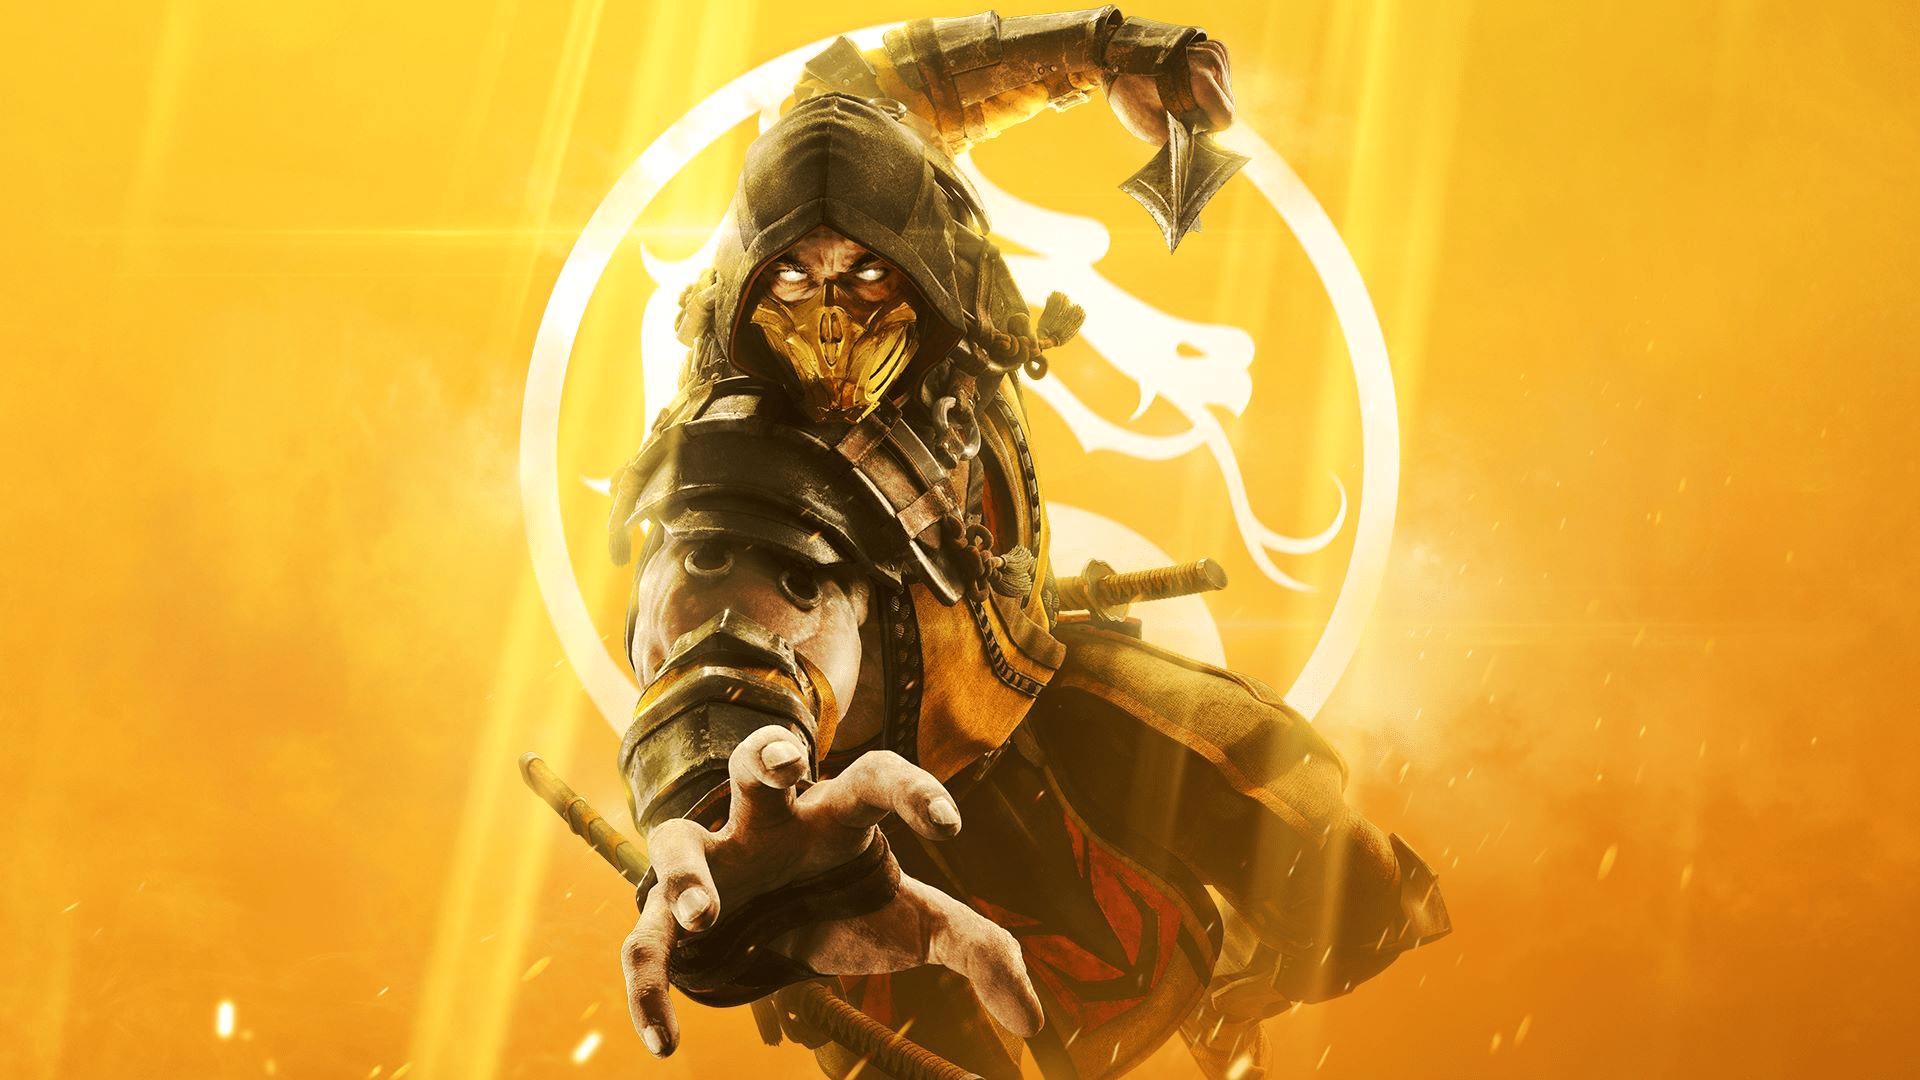 Mortal Kombat 11 first DLC details to be announced next week